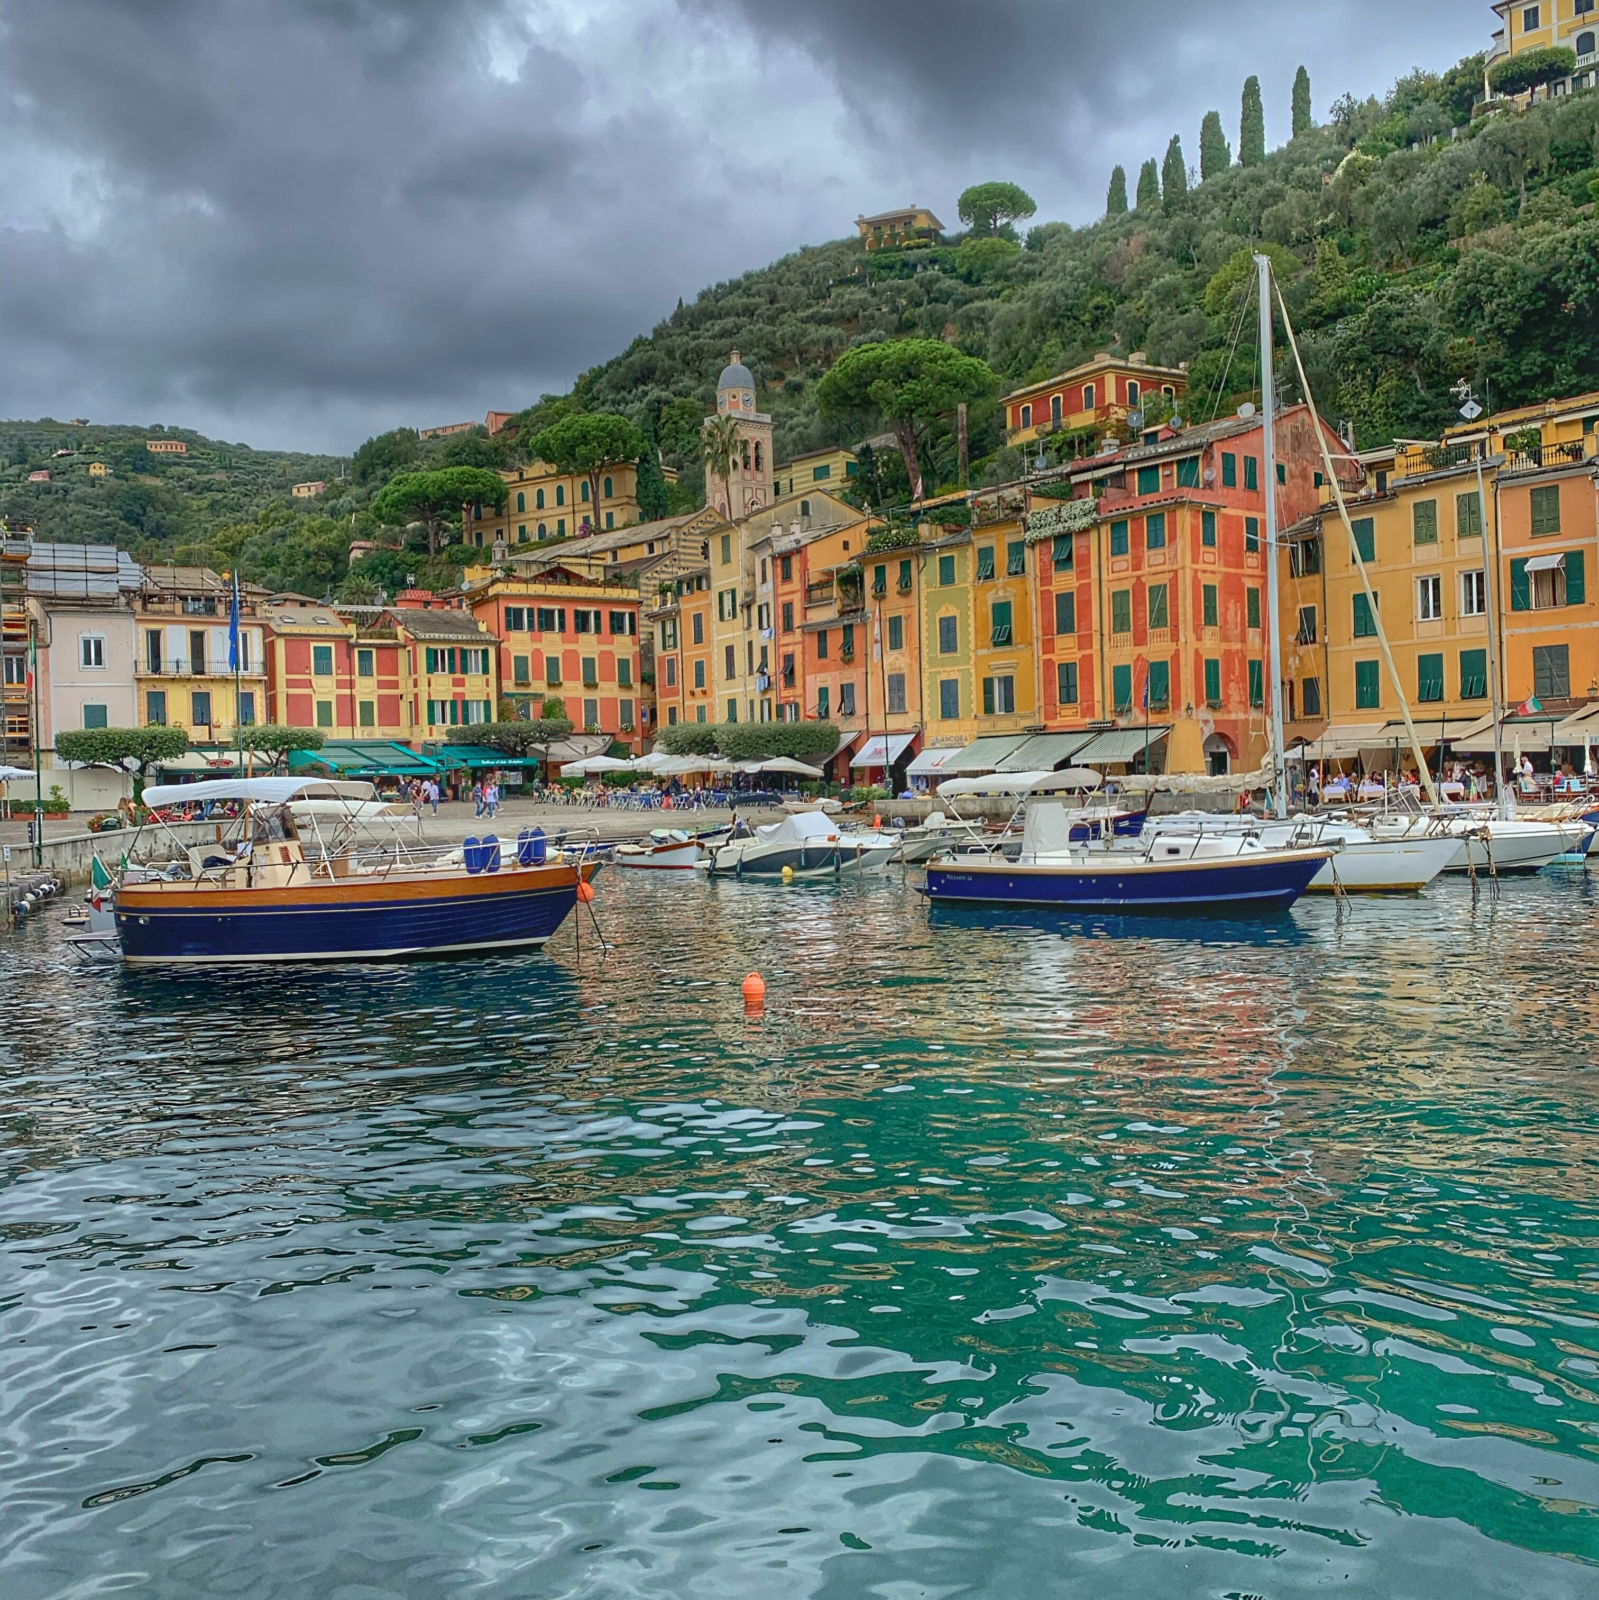 Farbenprächtige Häuser in Portofino